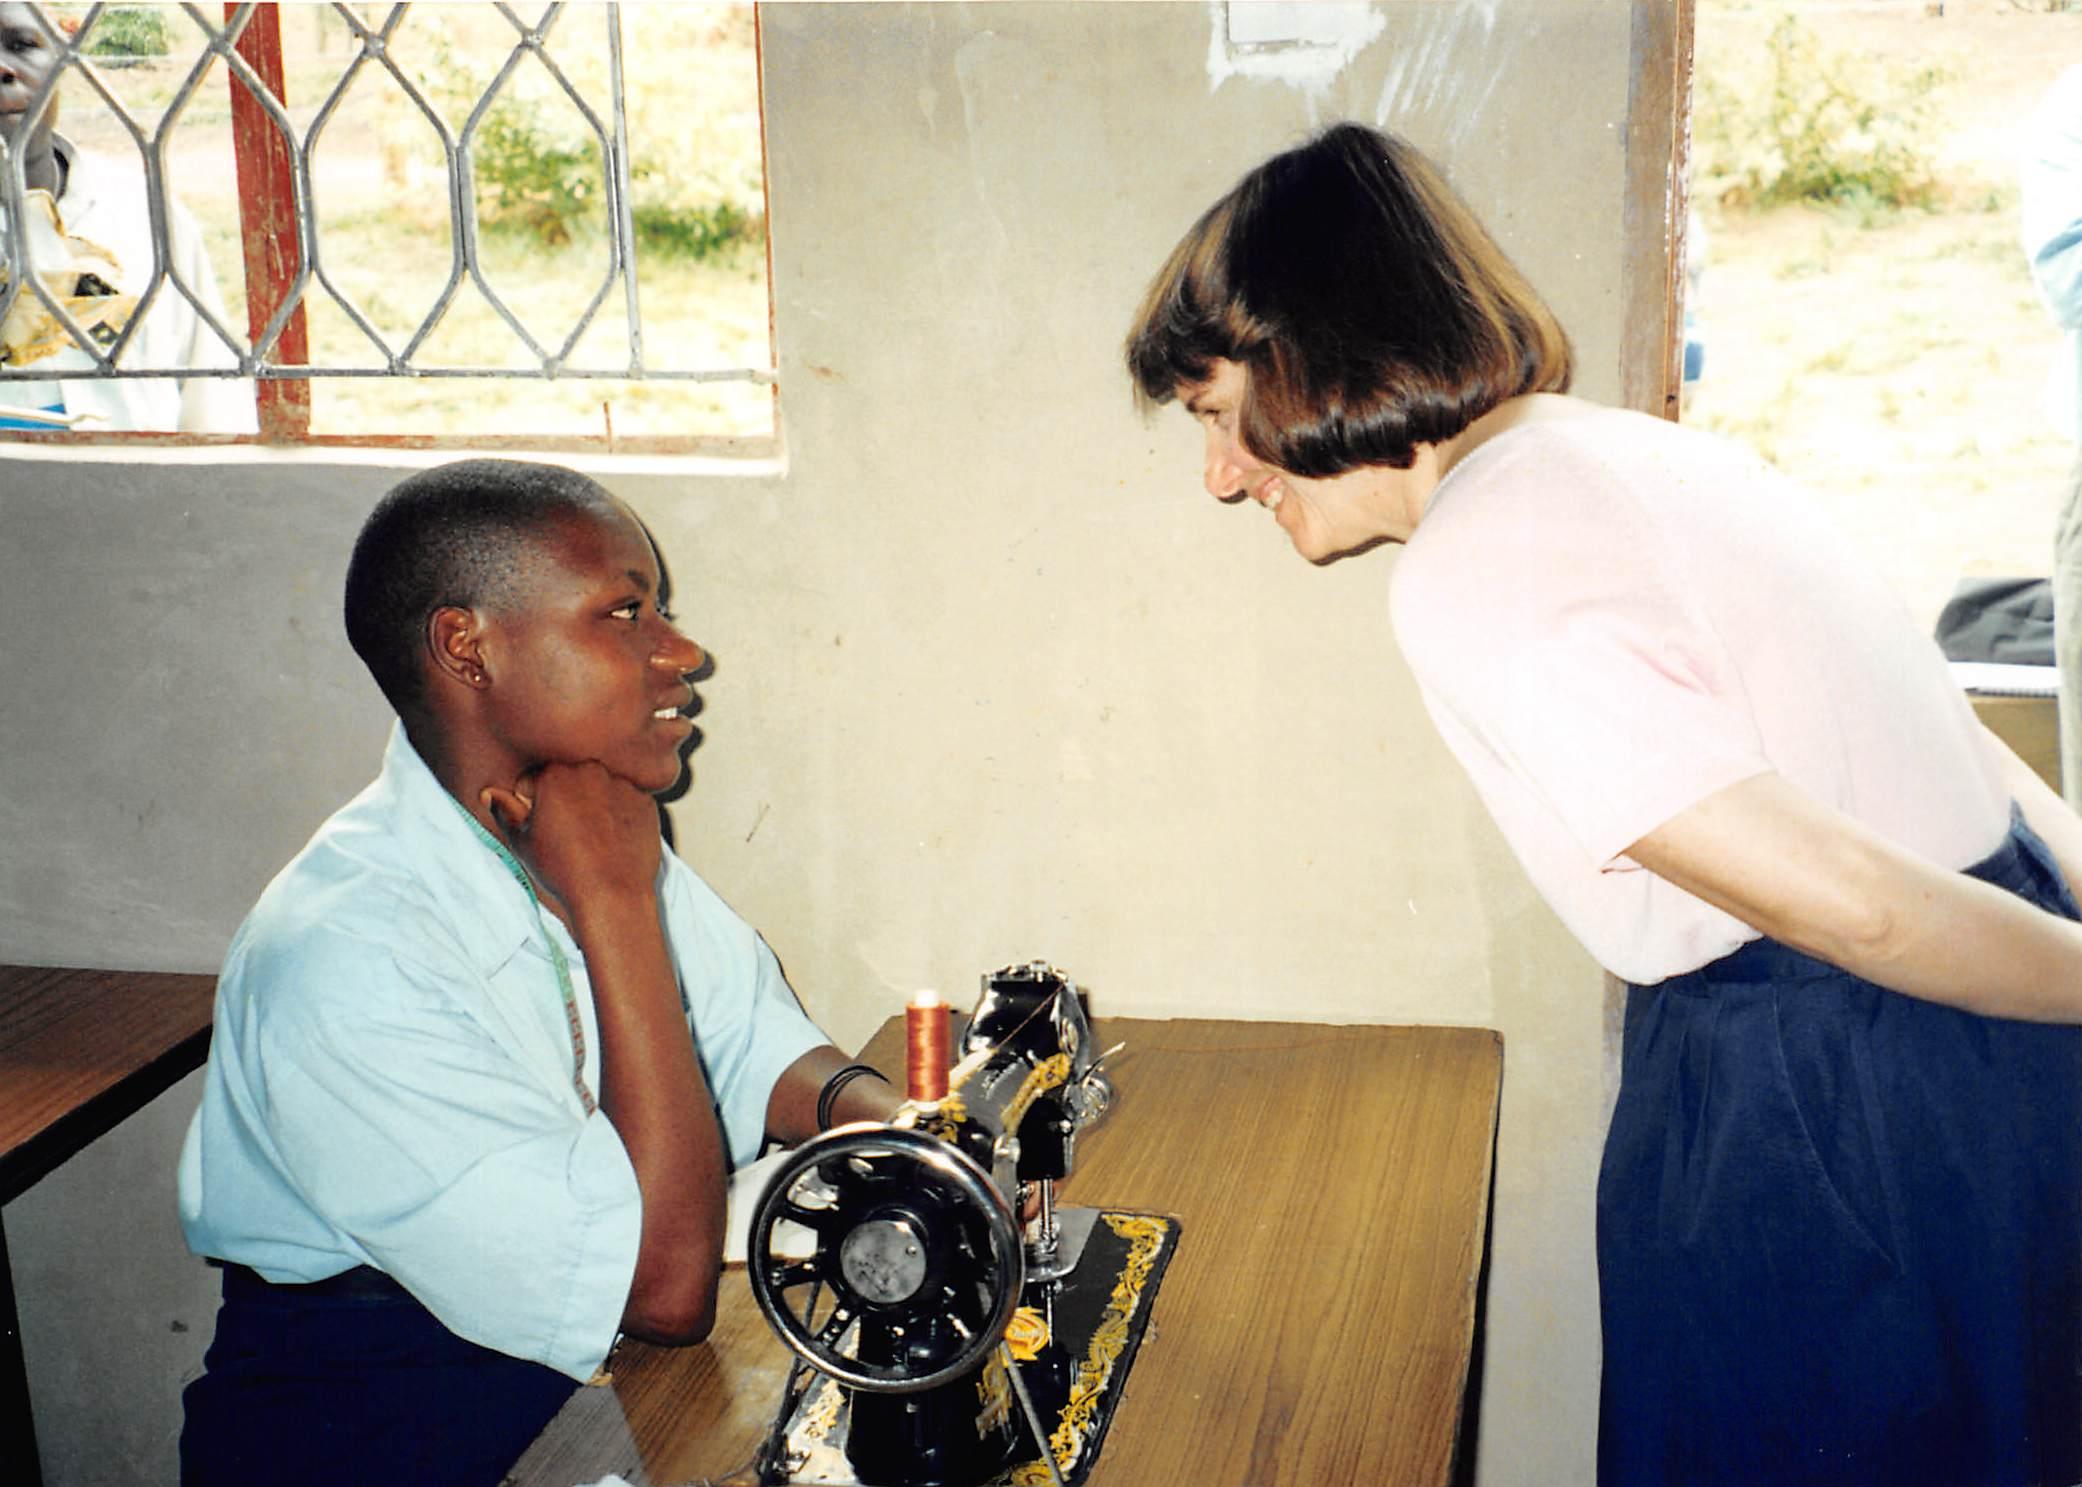 Uganda 2002 (Photo by Gawaher Atif)